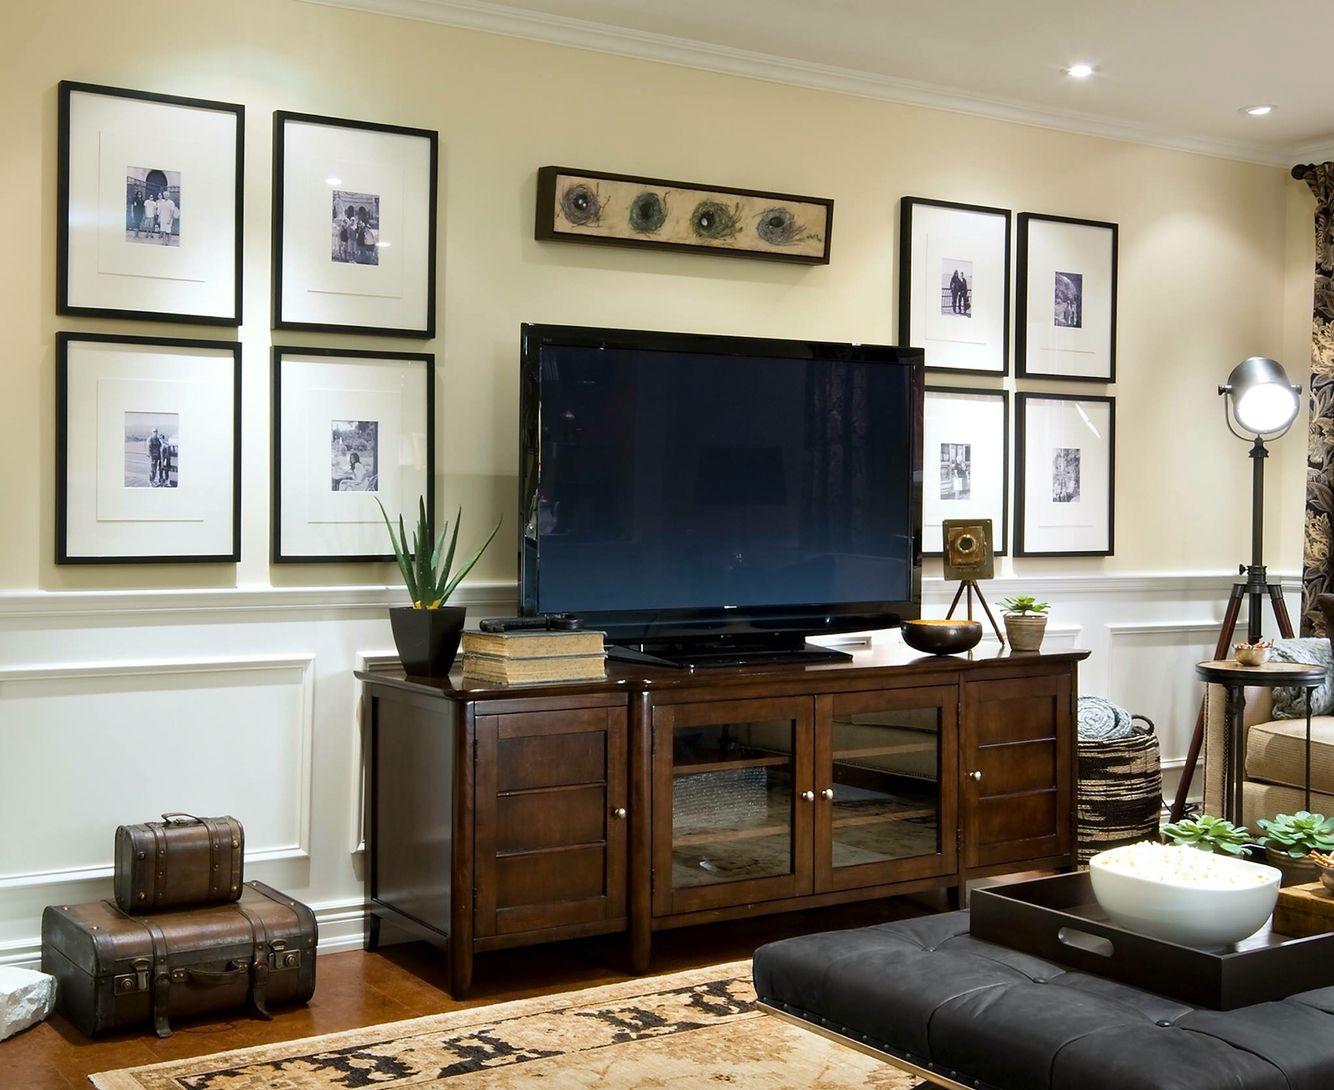 Tv in gallery wall symmetrical design | Living room tv ...